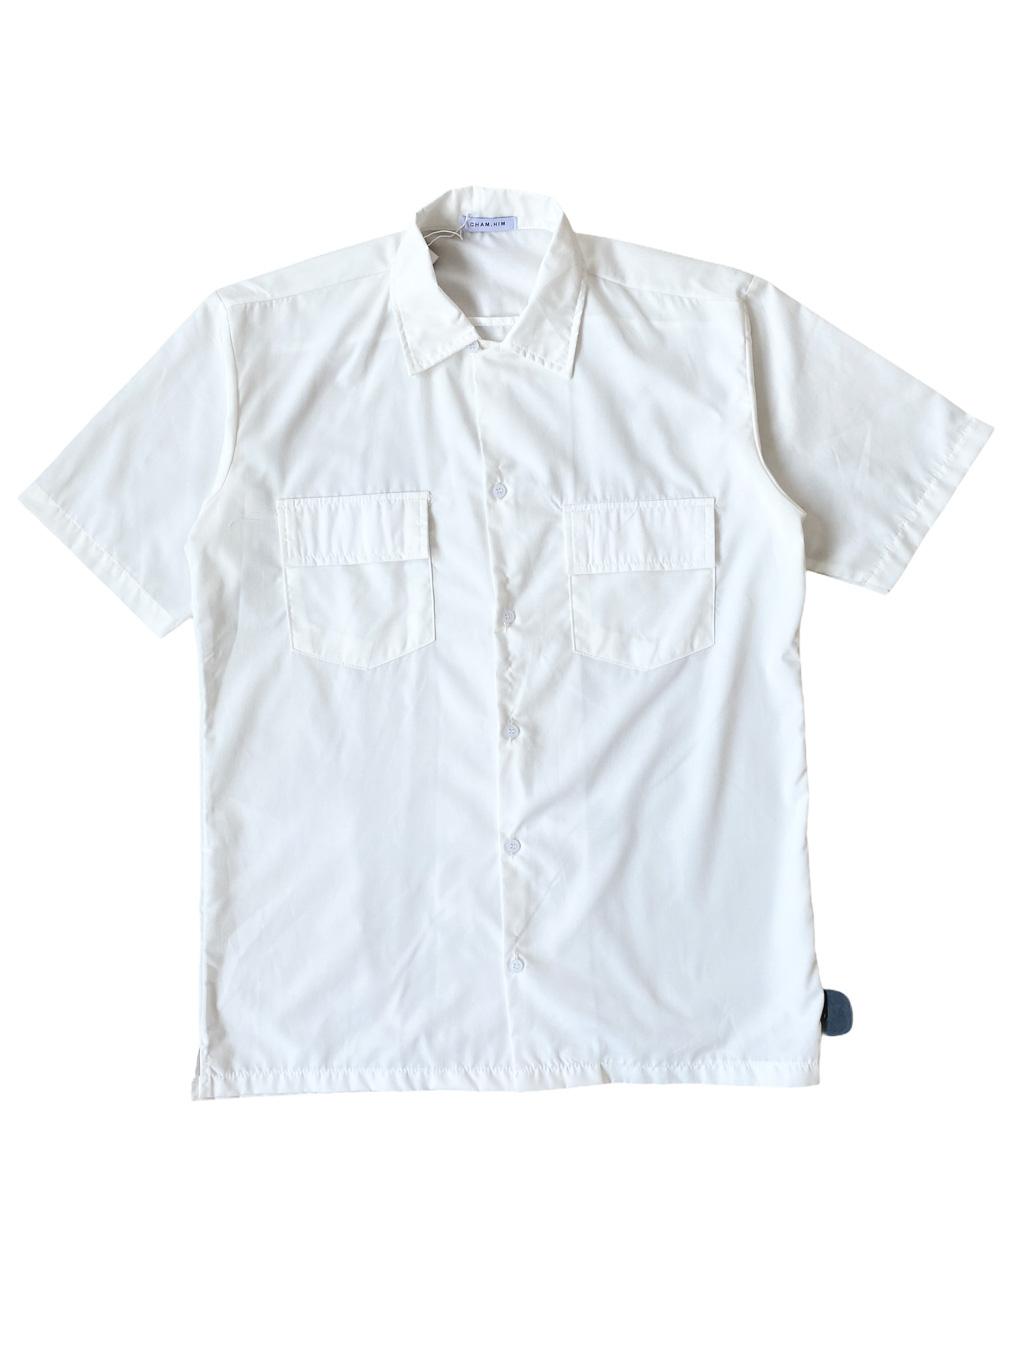 Benly Shirt  (White)